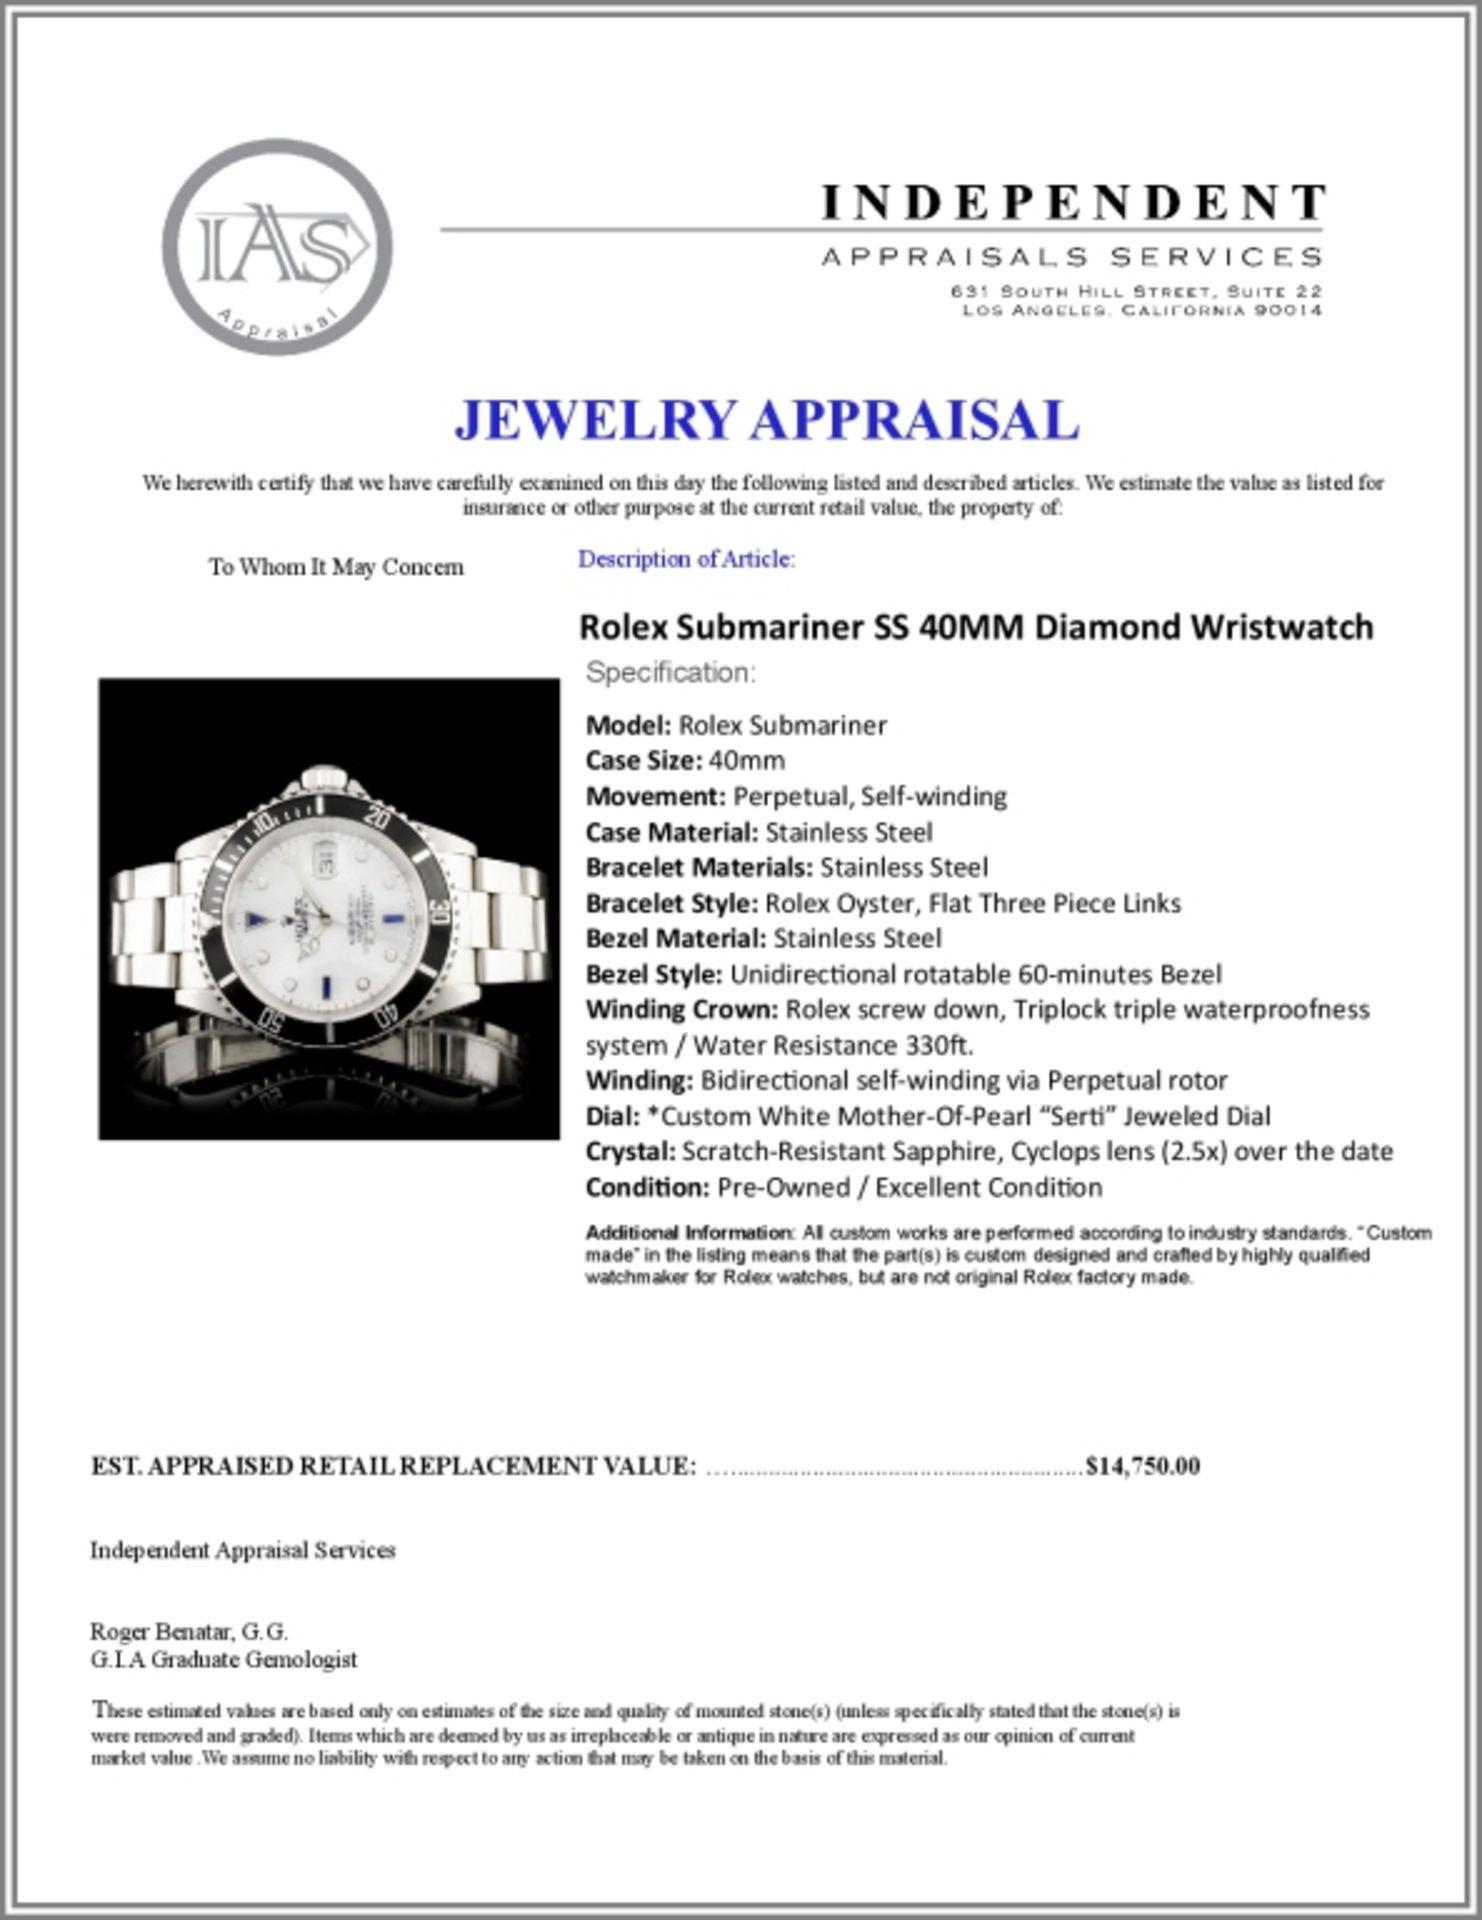 Rolex Submariner SS 40MM Diamond Wristwatch - Image 7 of 7